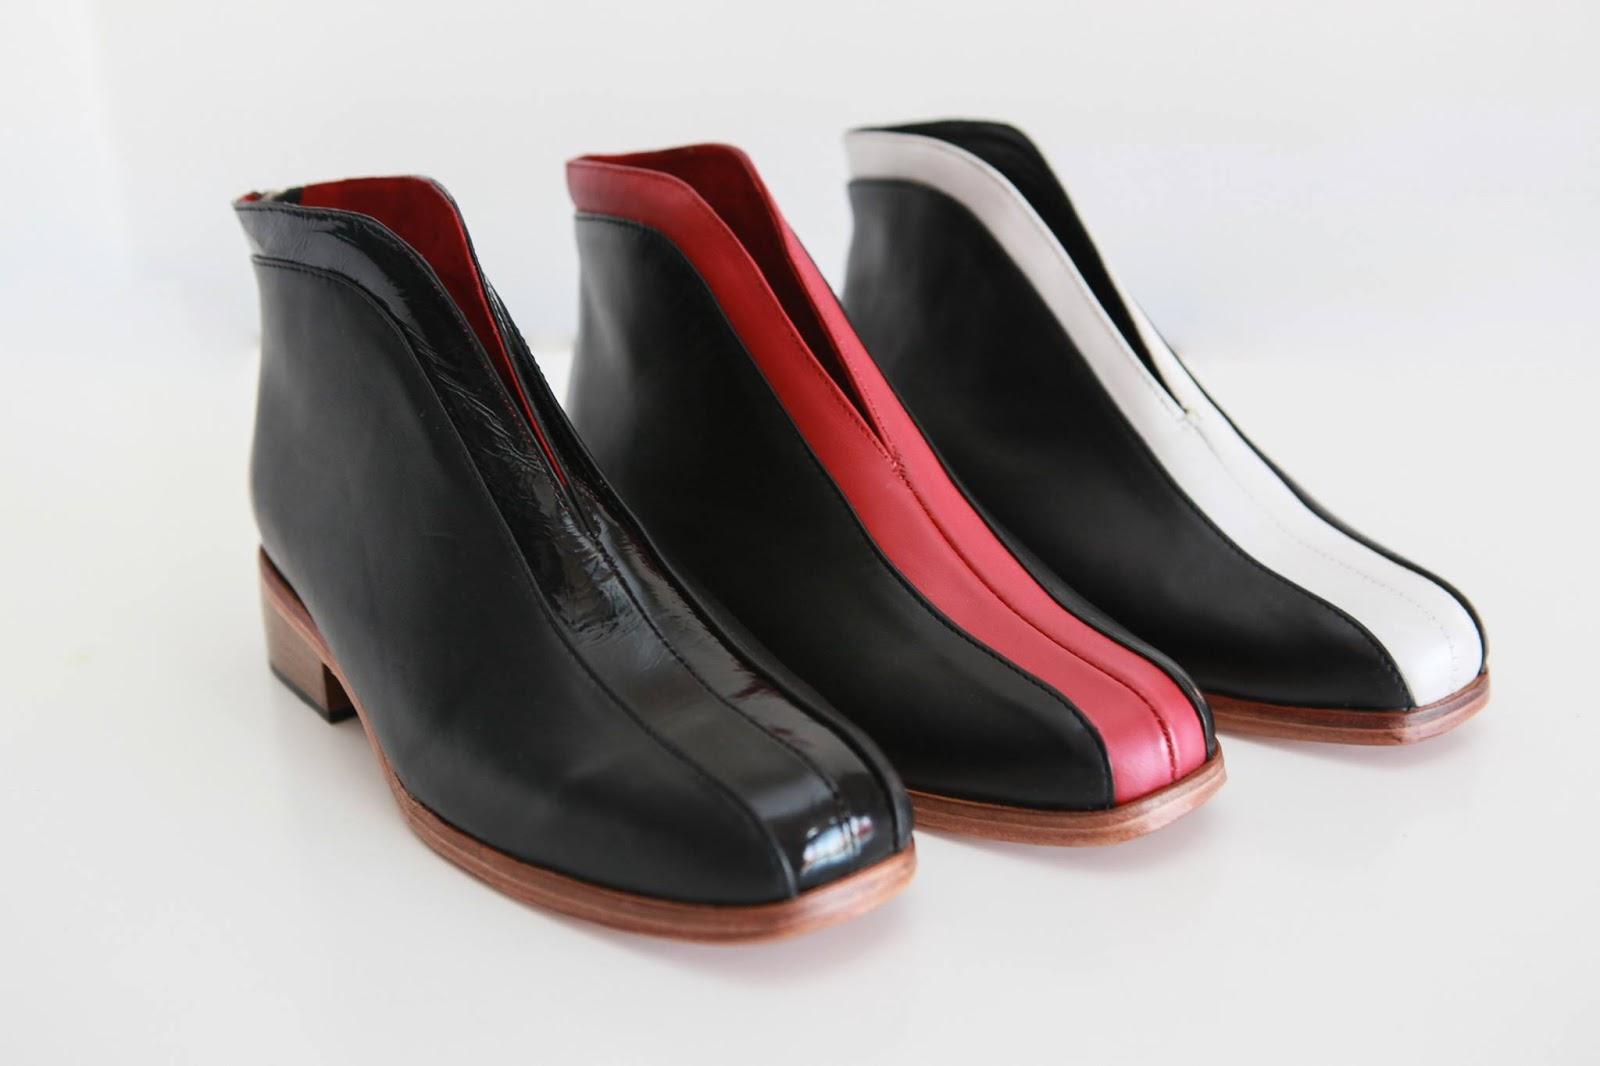 65da78b3c3 Cuarentatacos: zapatos de sutil elegancia   Quinta trends   Bloglovin'